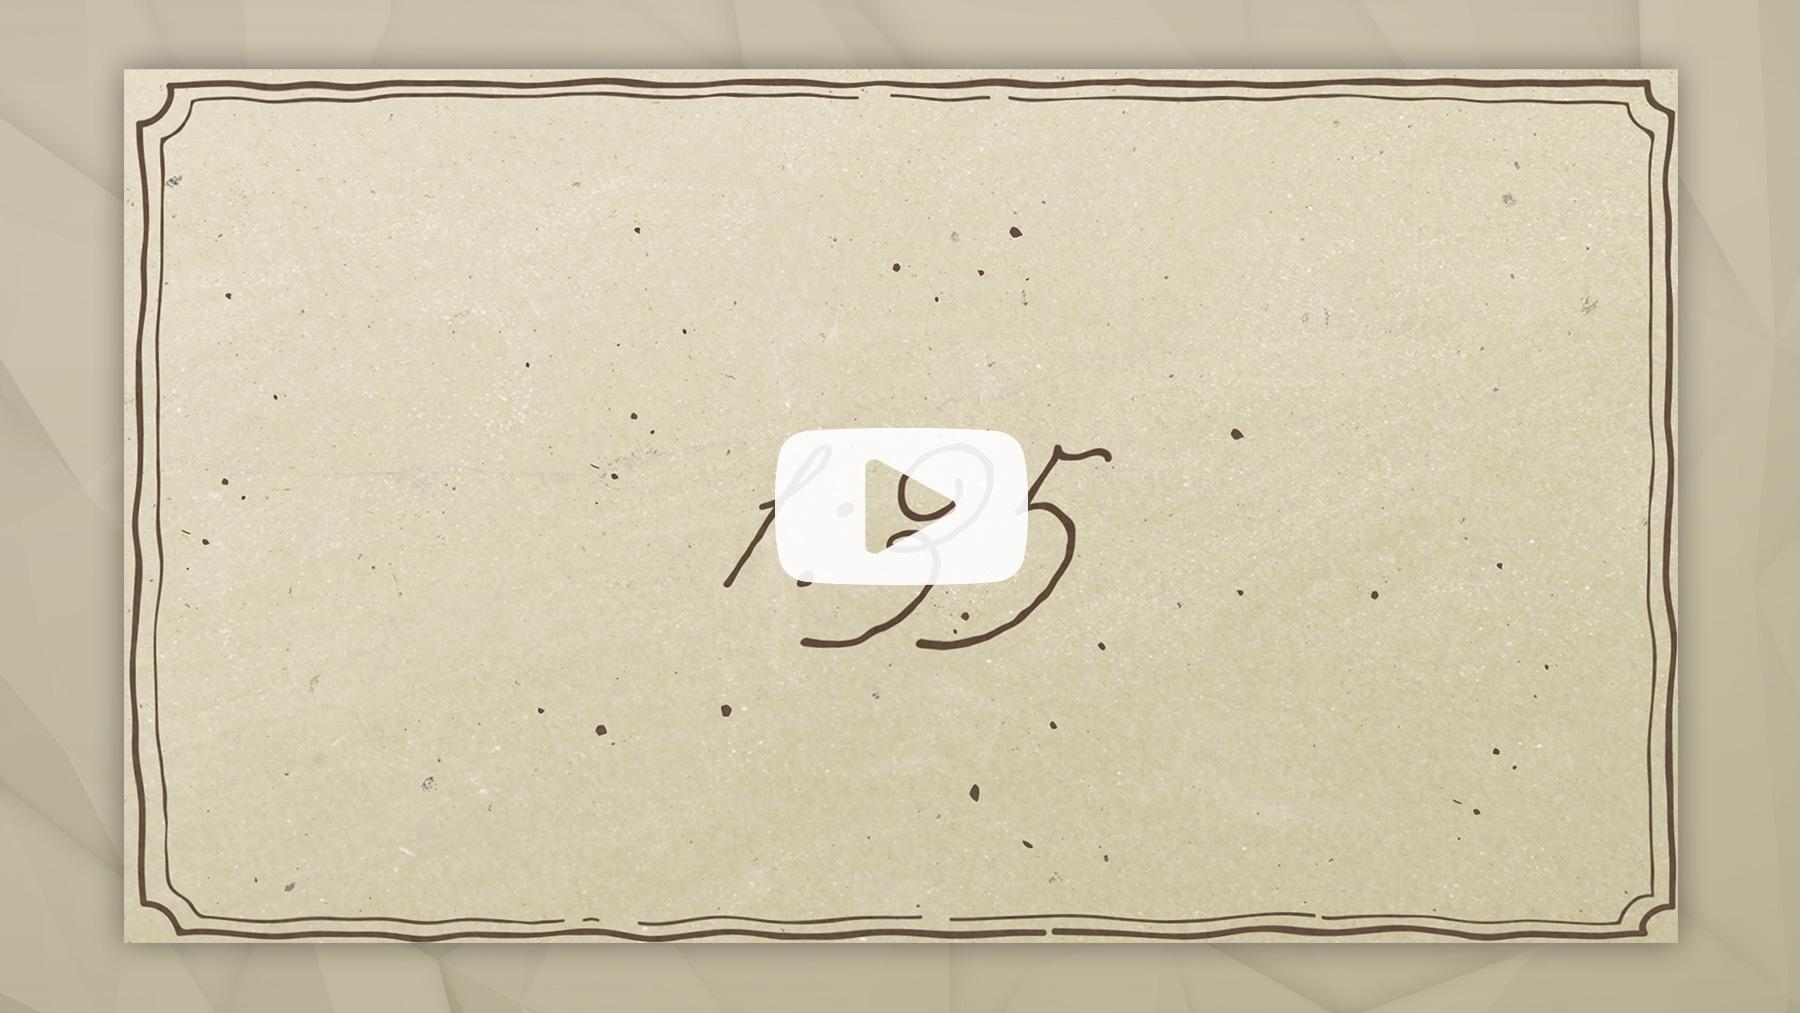 Hfth Countdown Video